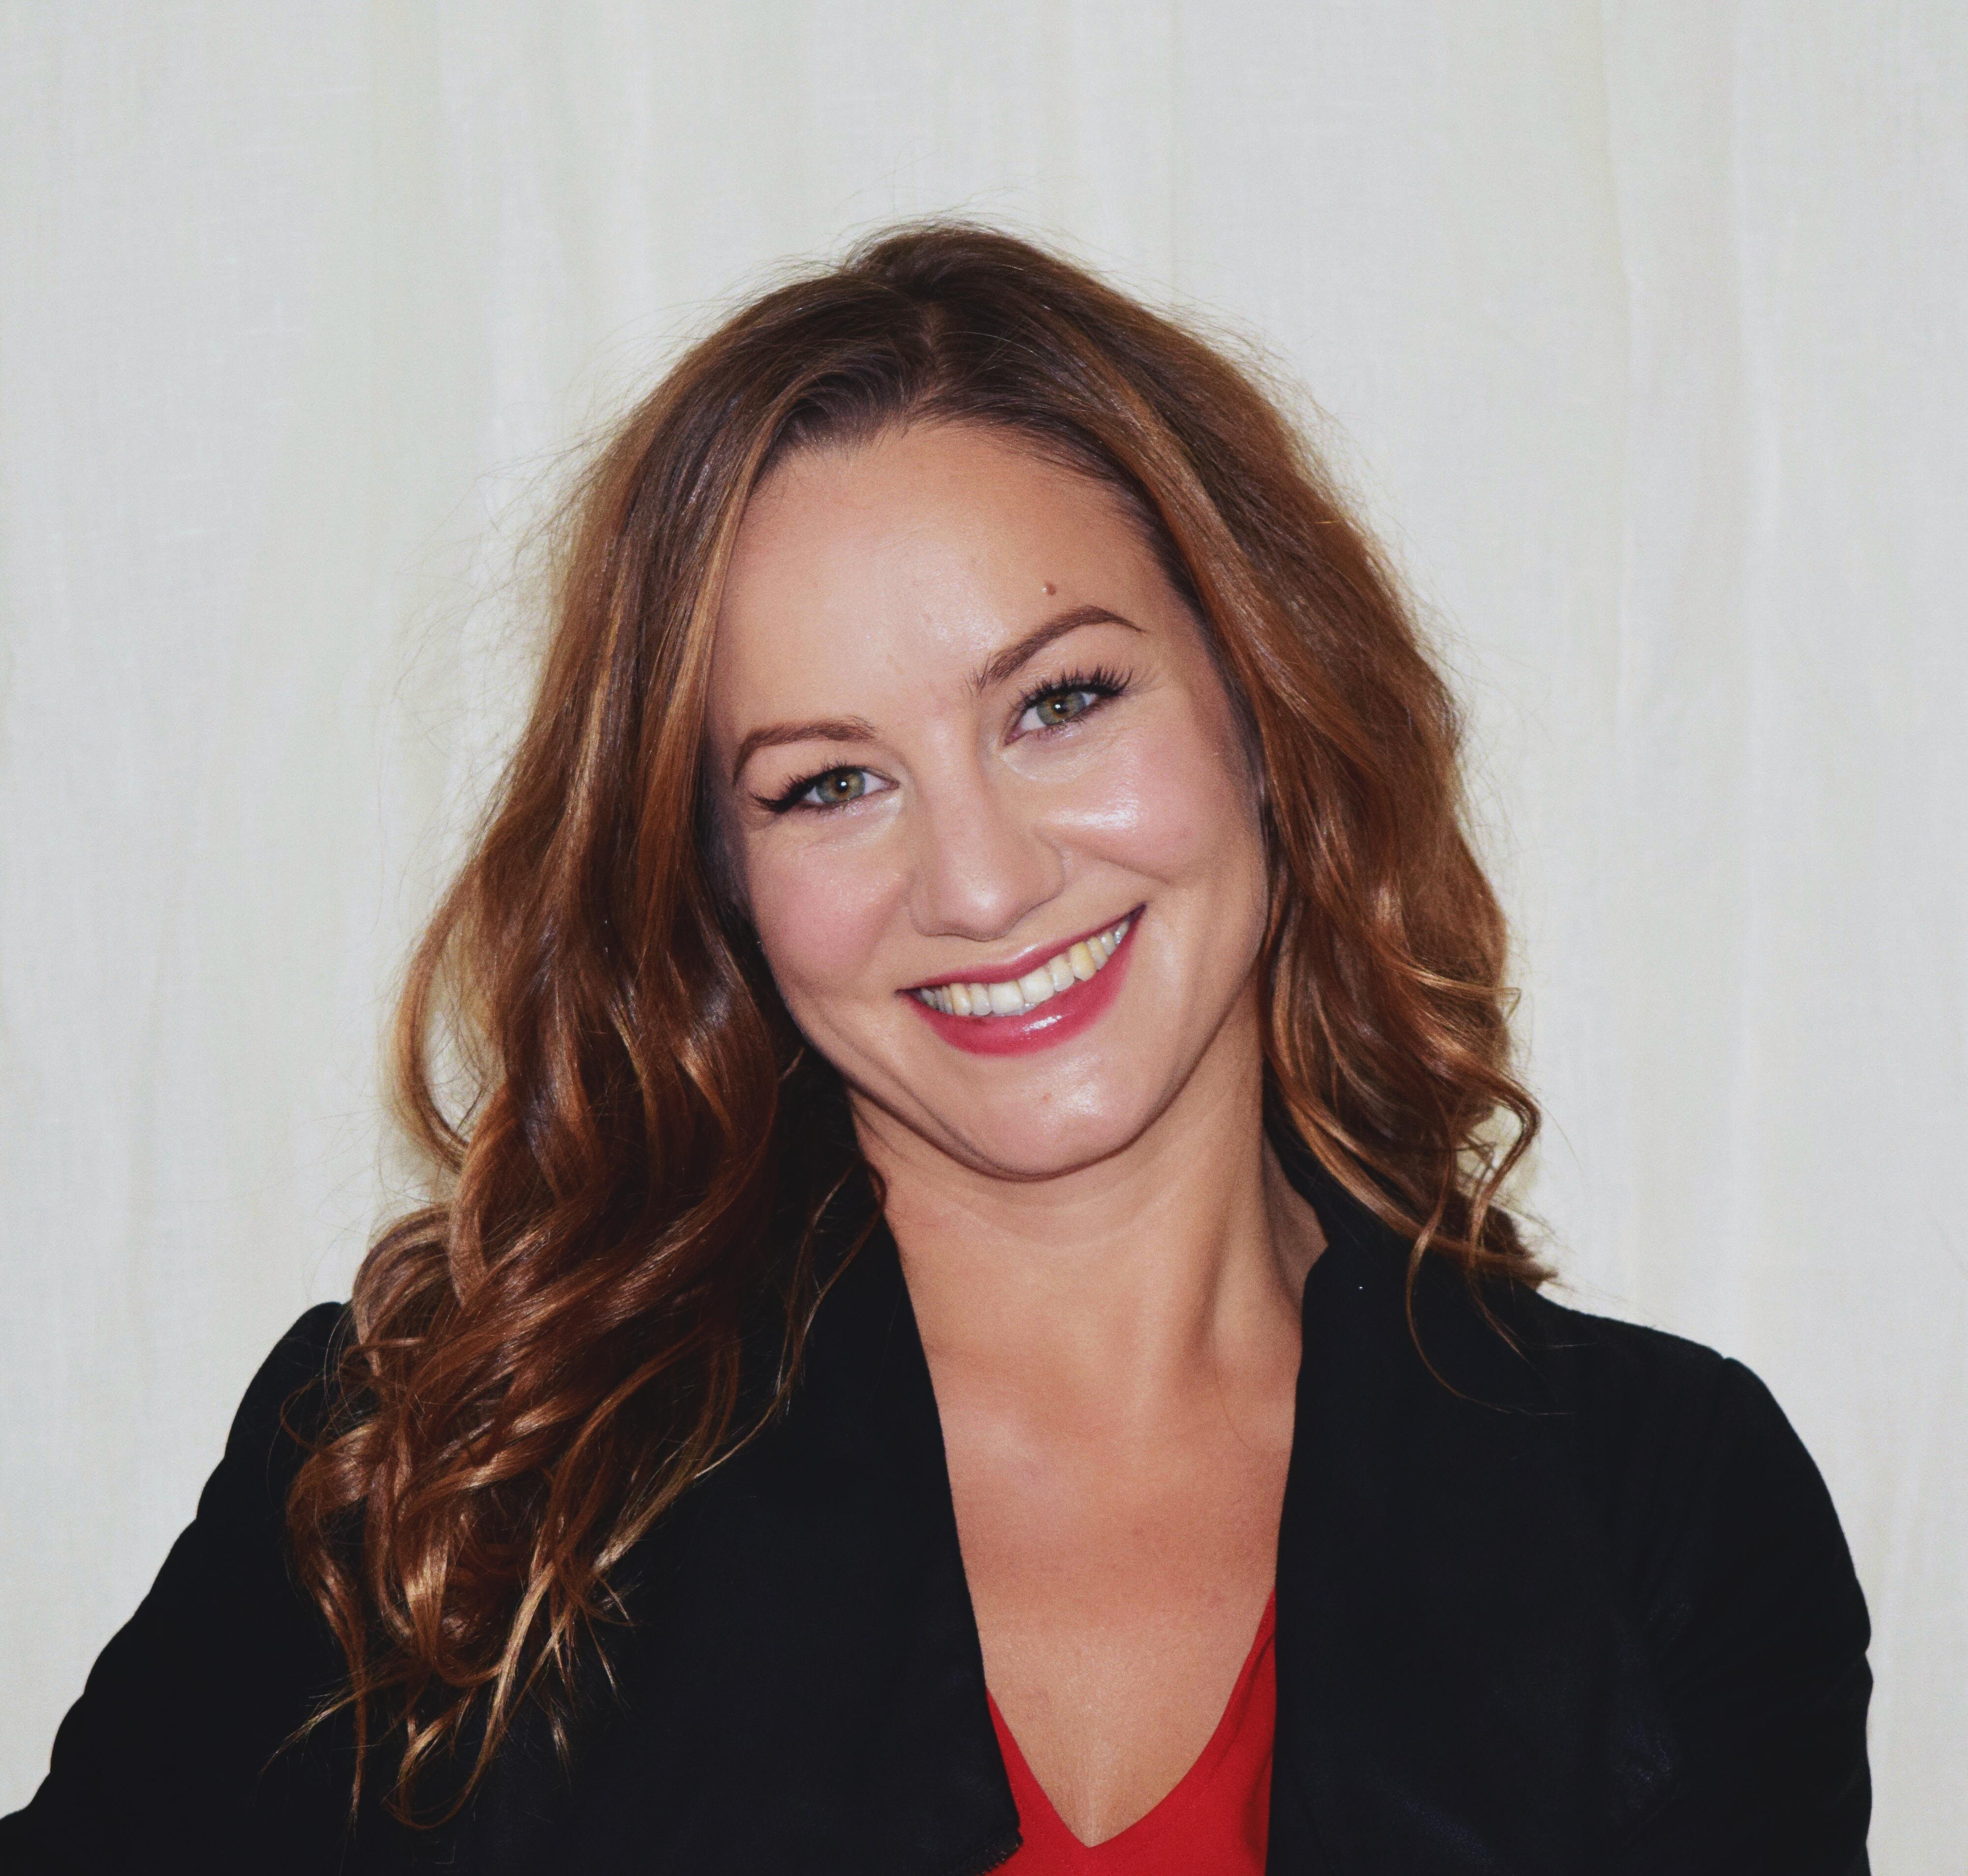 Lindsay Chastain